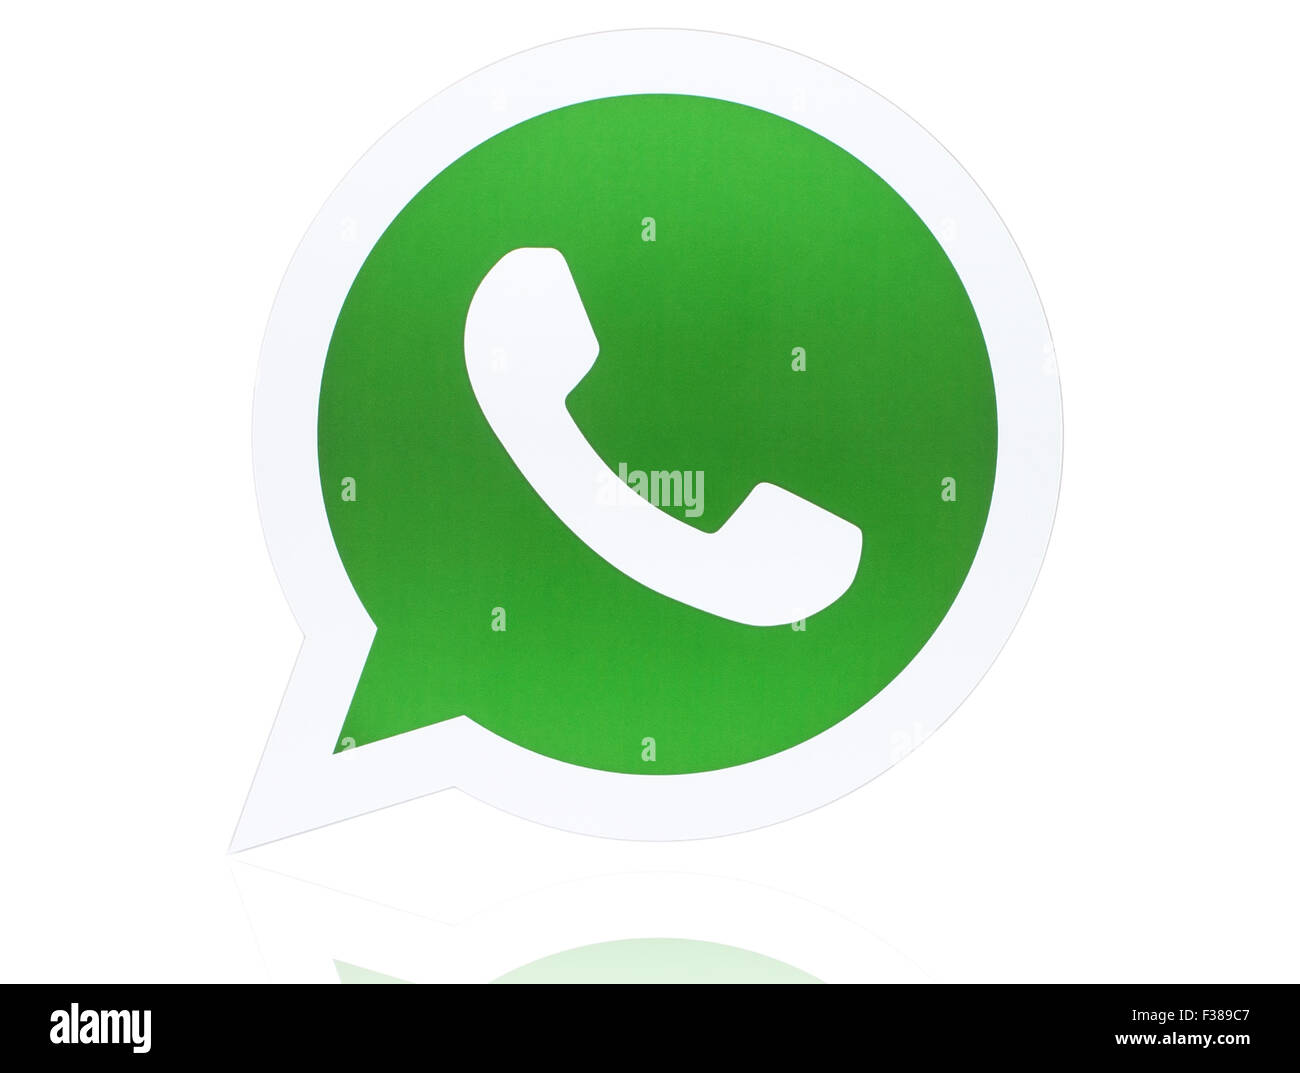 KIEV, UKRAINE - APRIL 27, 2015:WhatsApp Messenger logotype printed on paper. - Stock Image